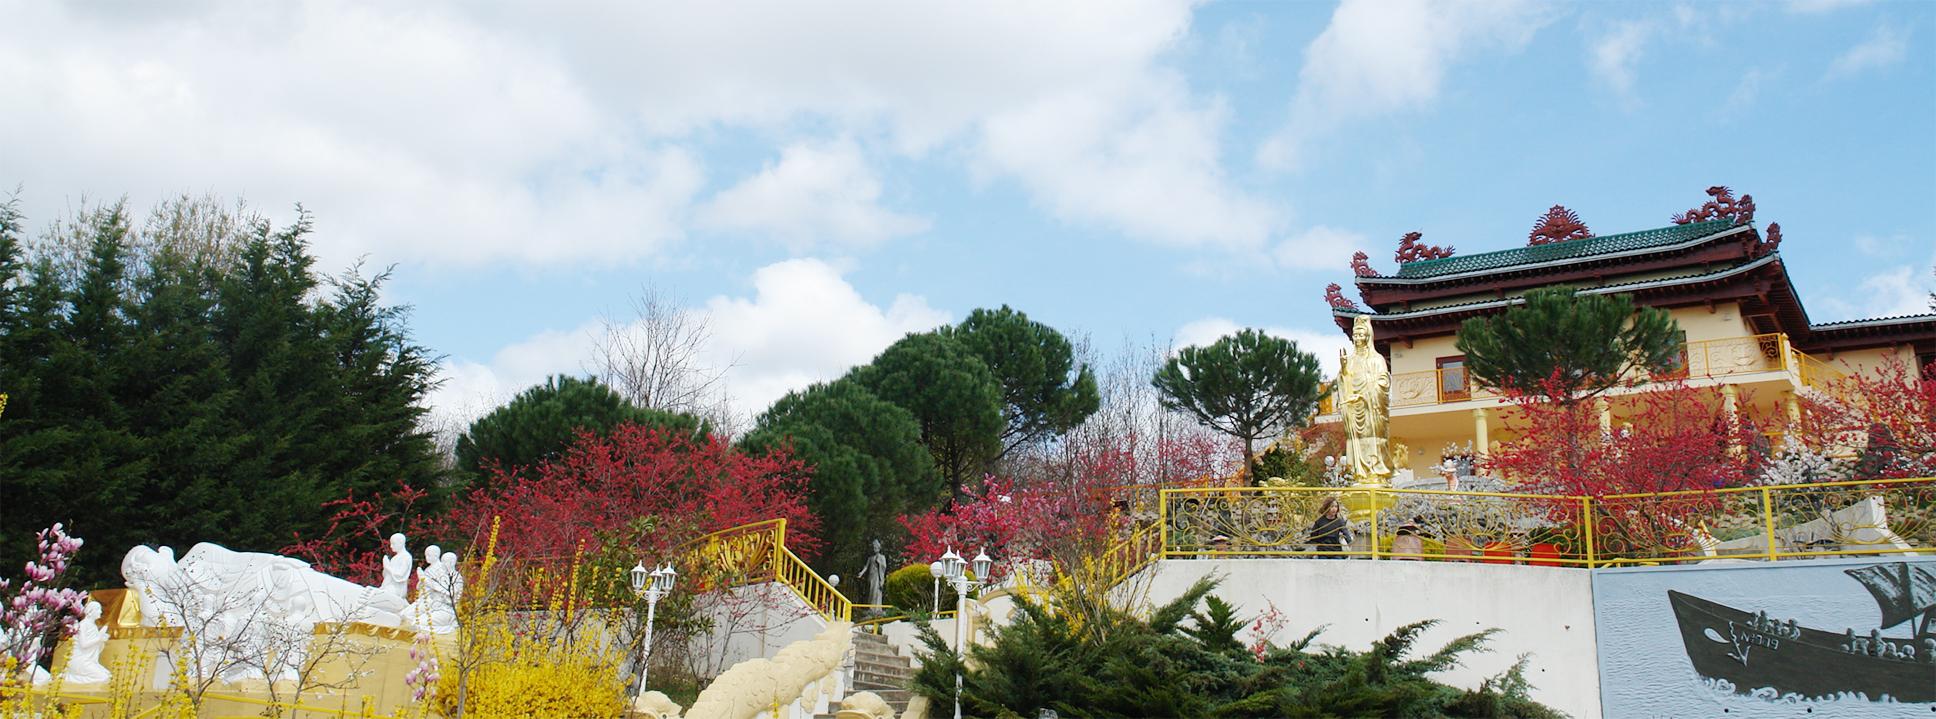 La pagode Thiện Minh